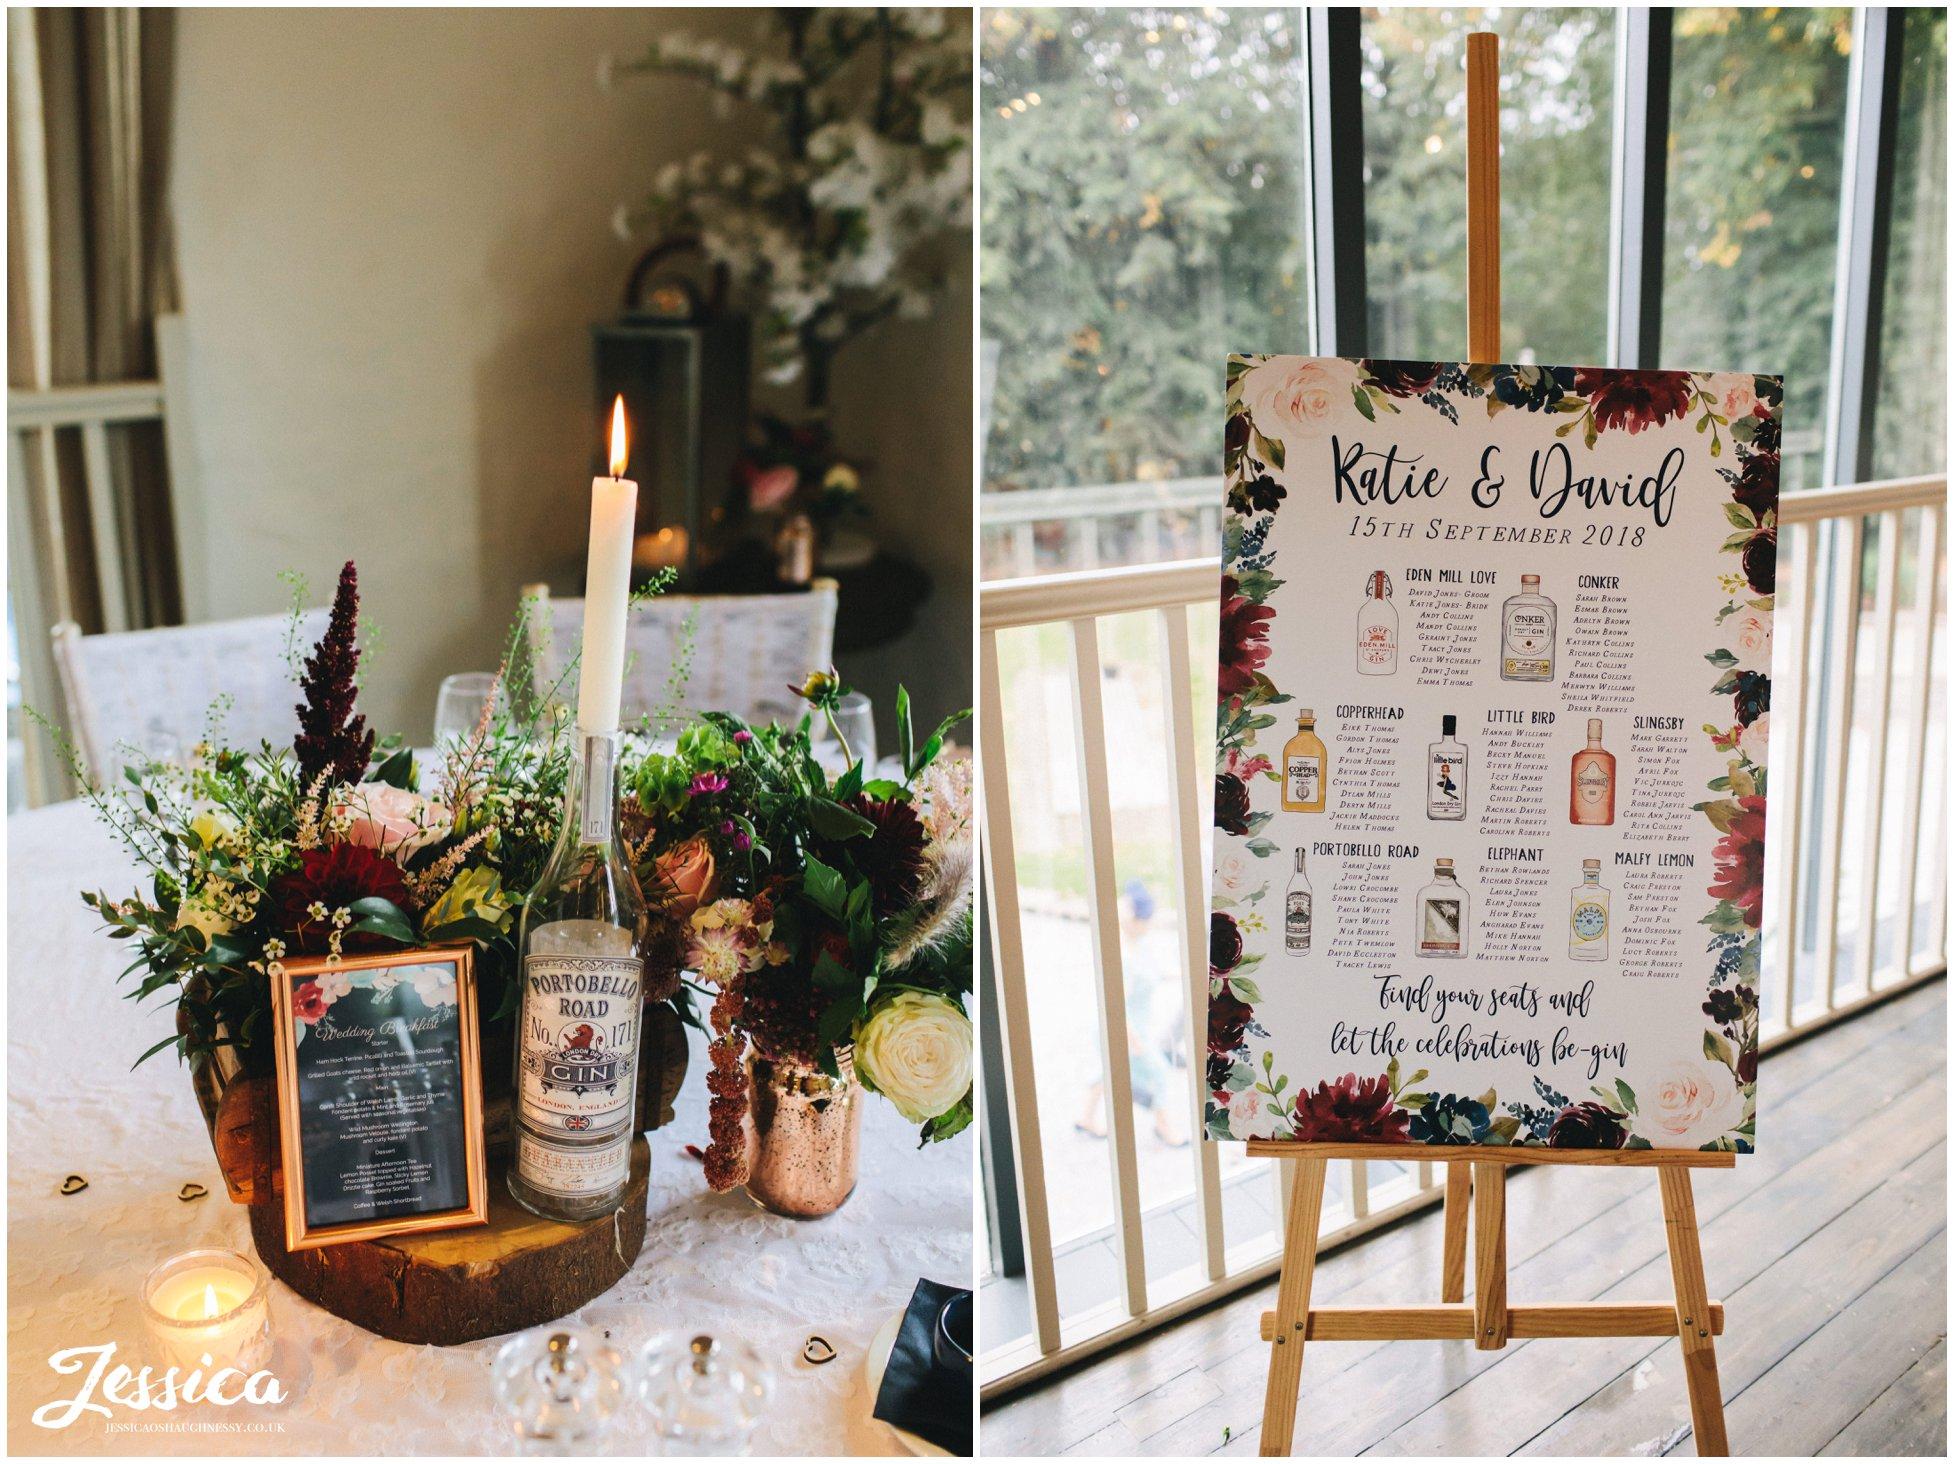 gin themed table plan for the Llanrhaeadr Springs wedding